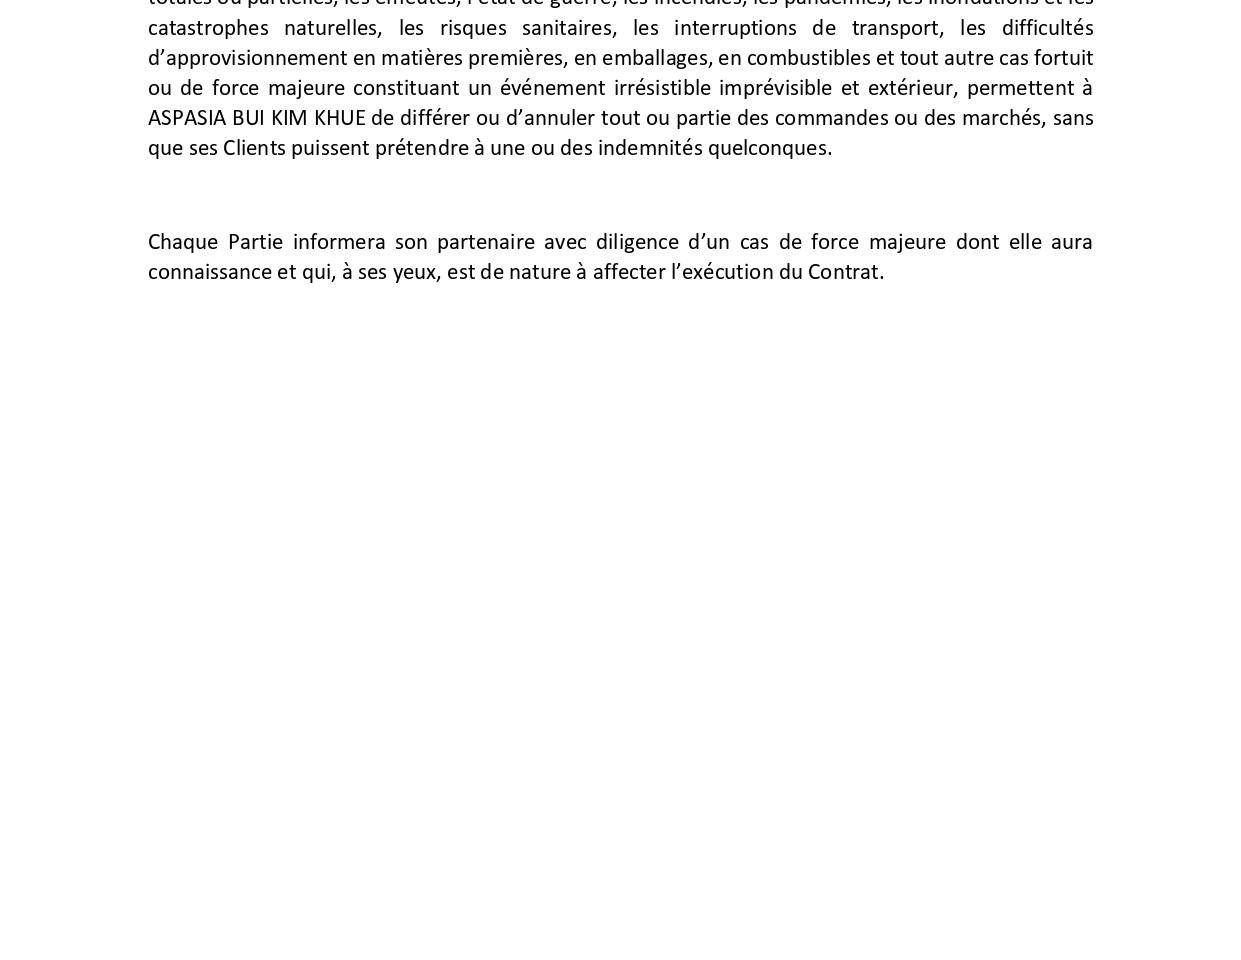 CGV ASPASIA 2020_page-0010.jpg